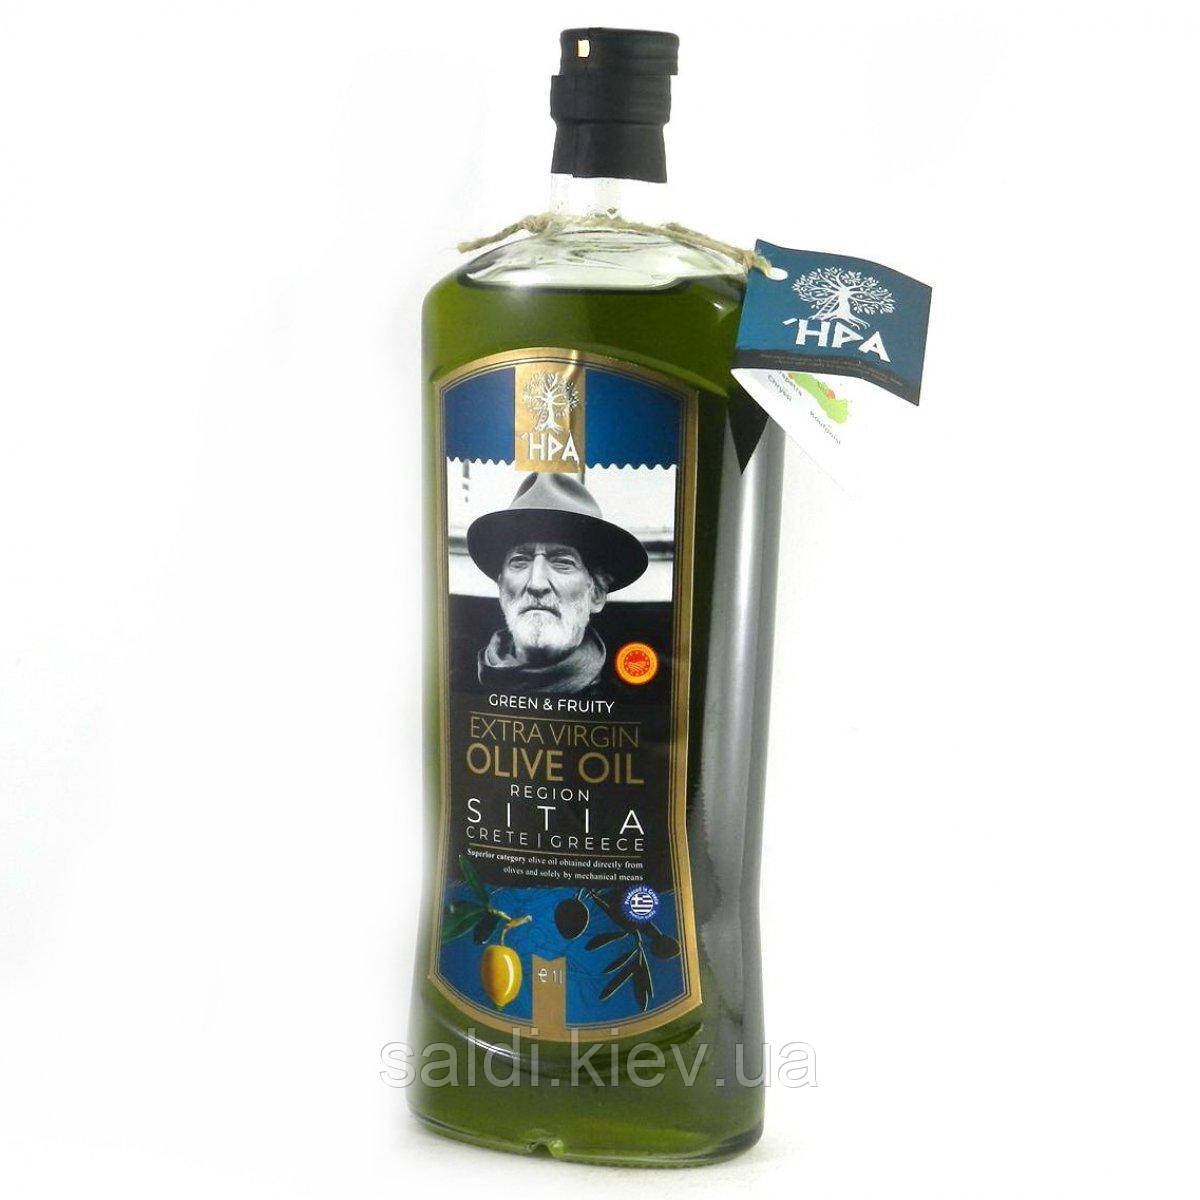 Оливковое масло холодного отжима HPA Green & Fruity extra virgin olive oil Region Sitia